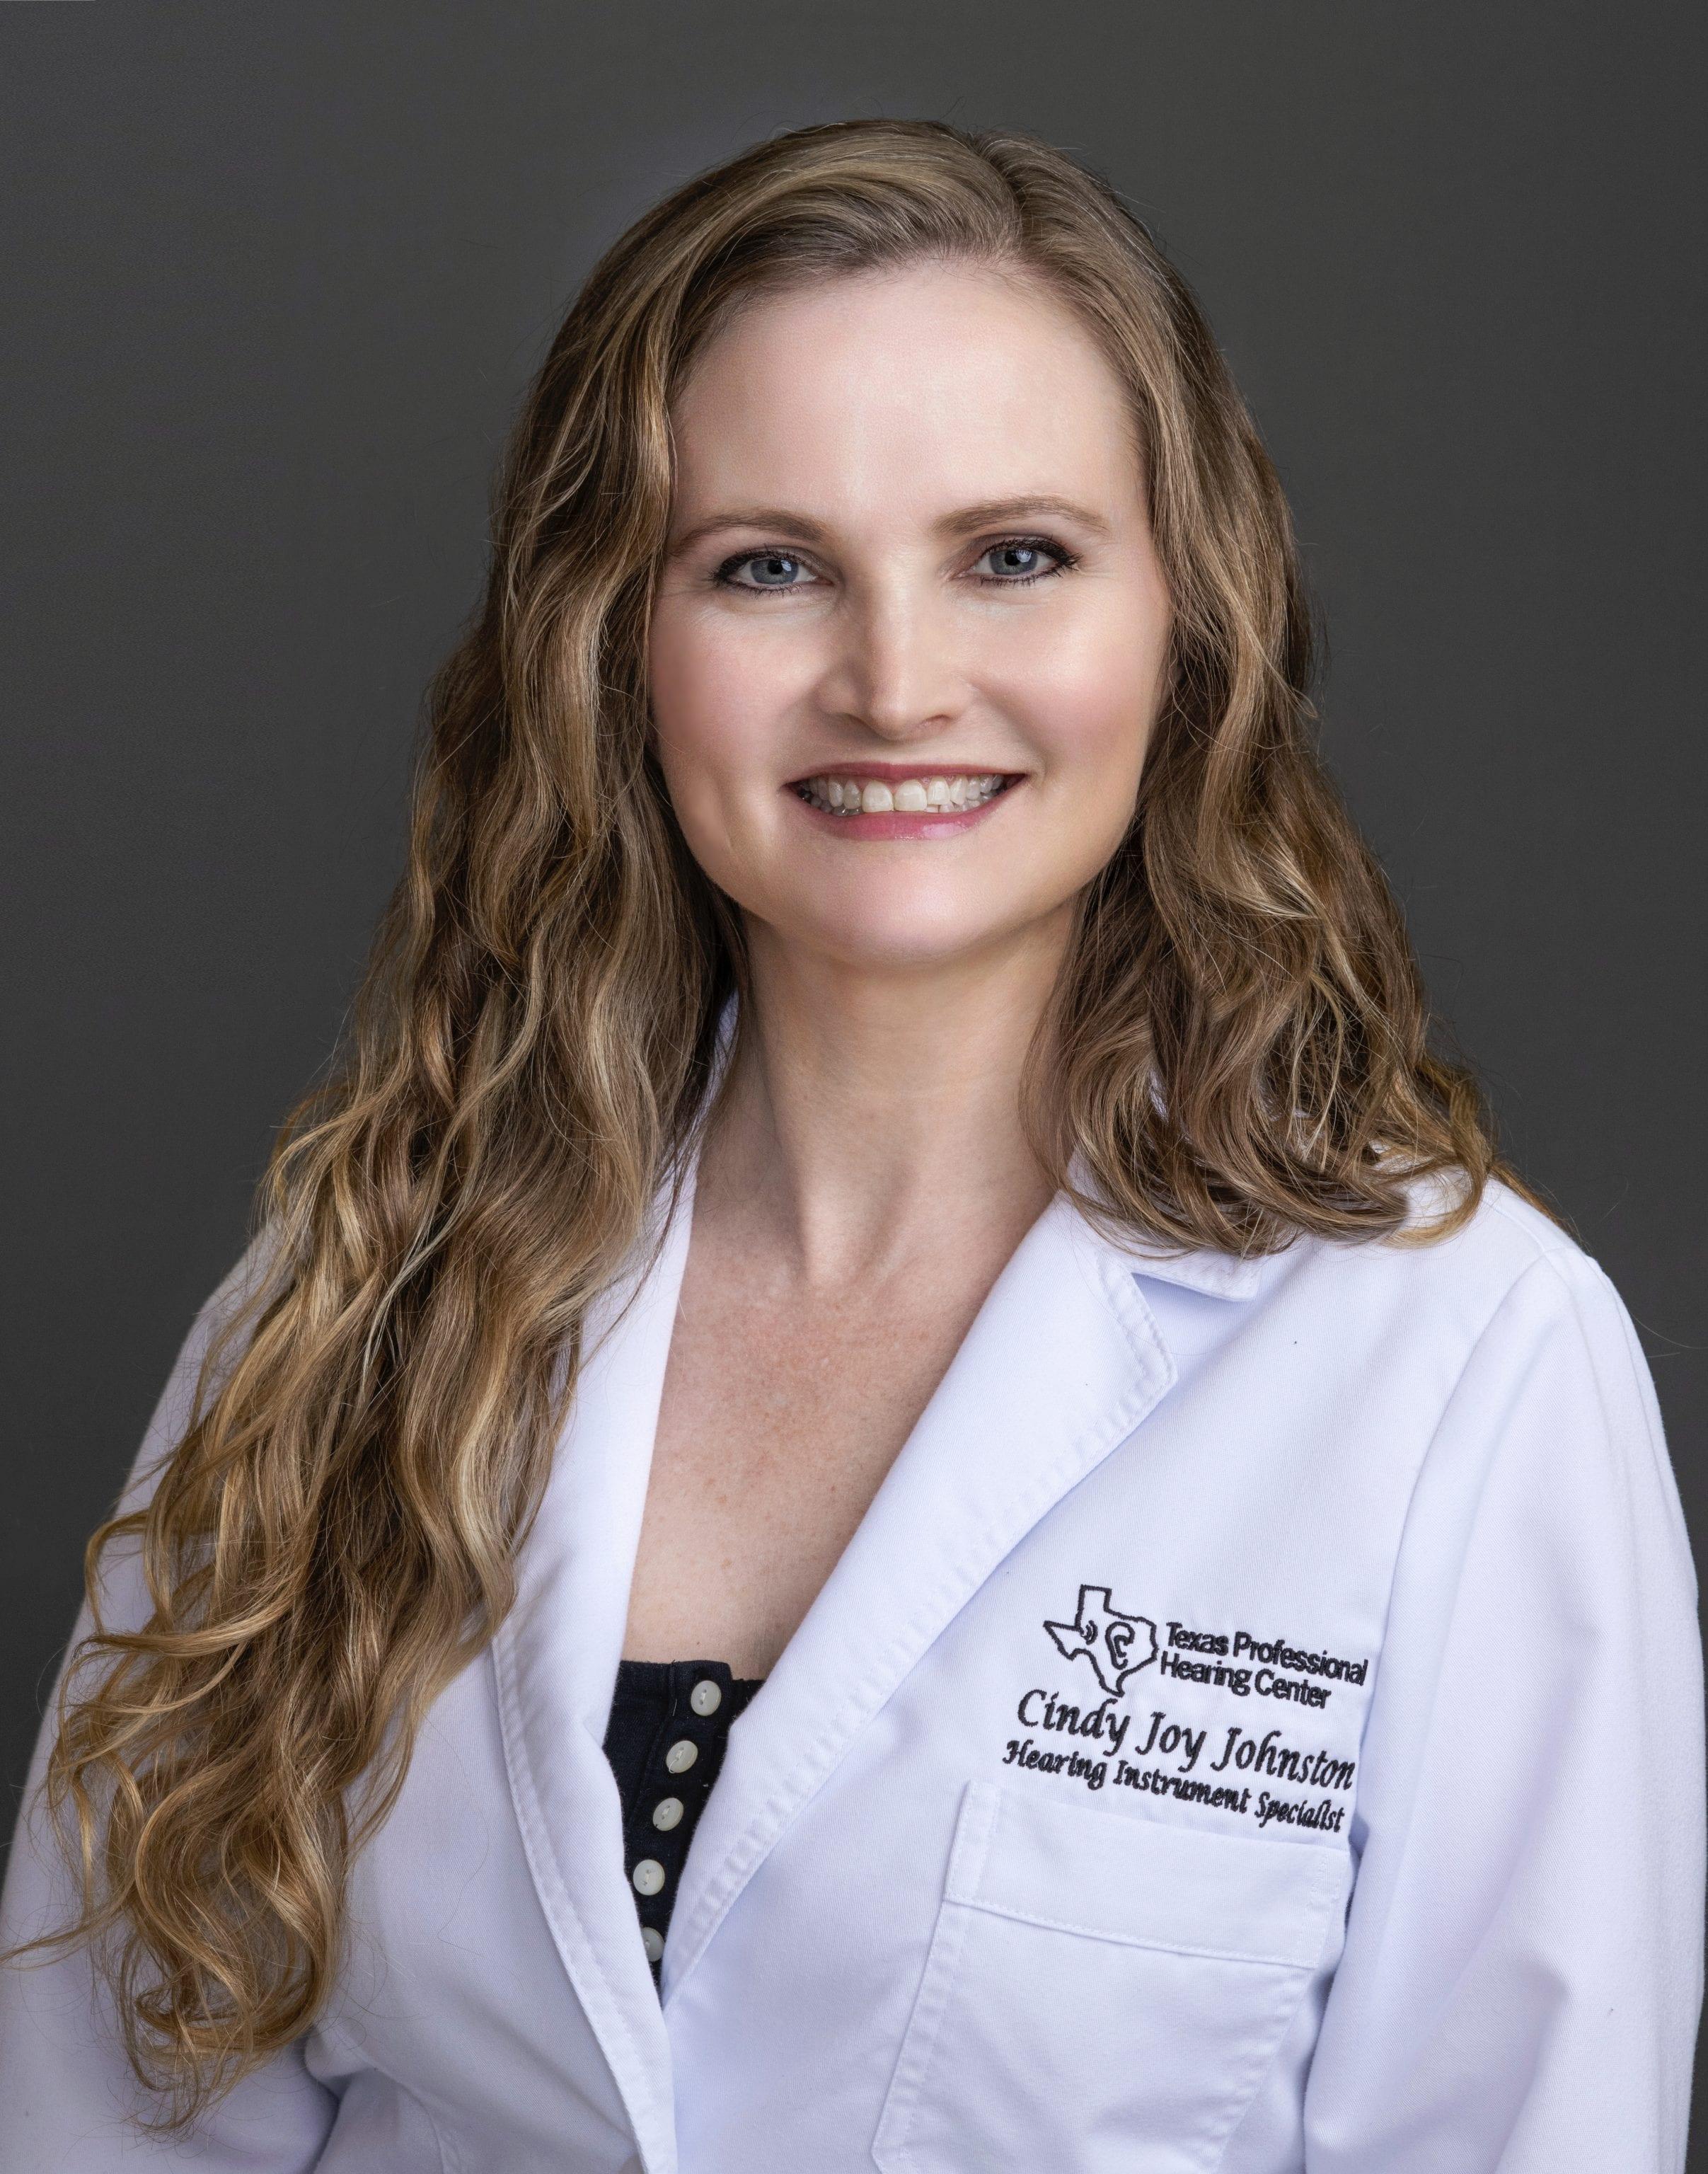 Cindy Joy Johnston : Hearing Instrument Specialist